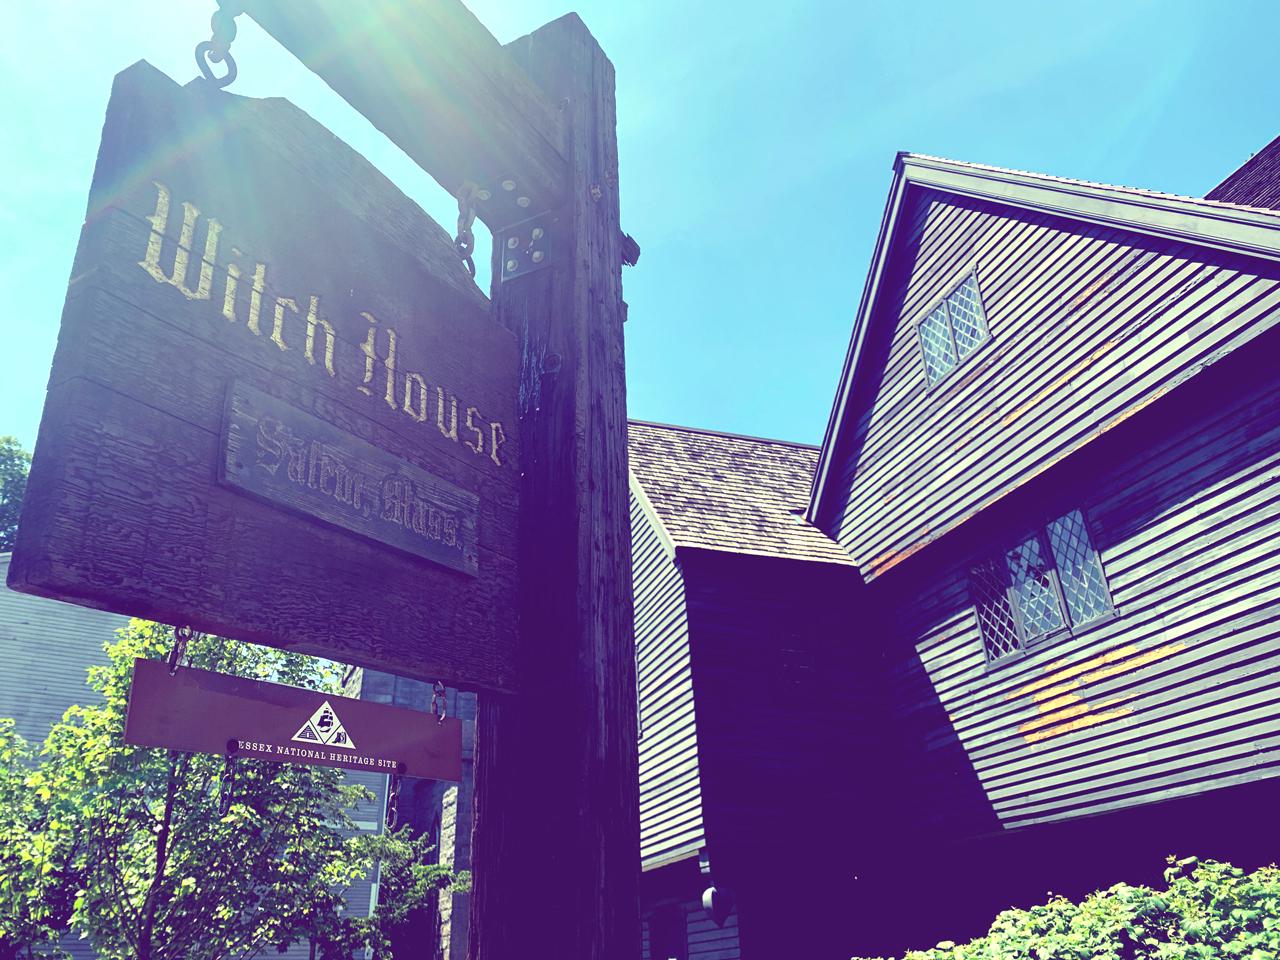 witch-house-salem-massachusetts-1280x960-02